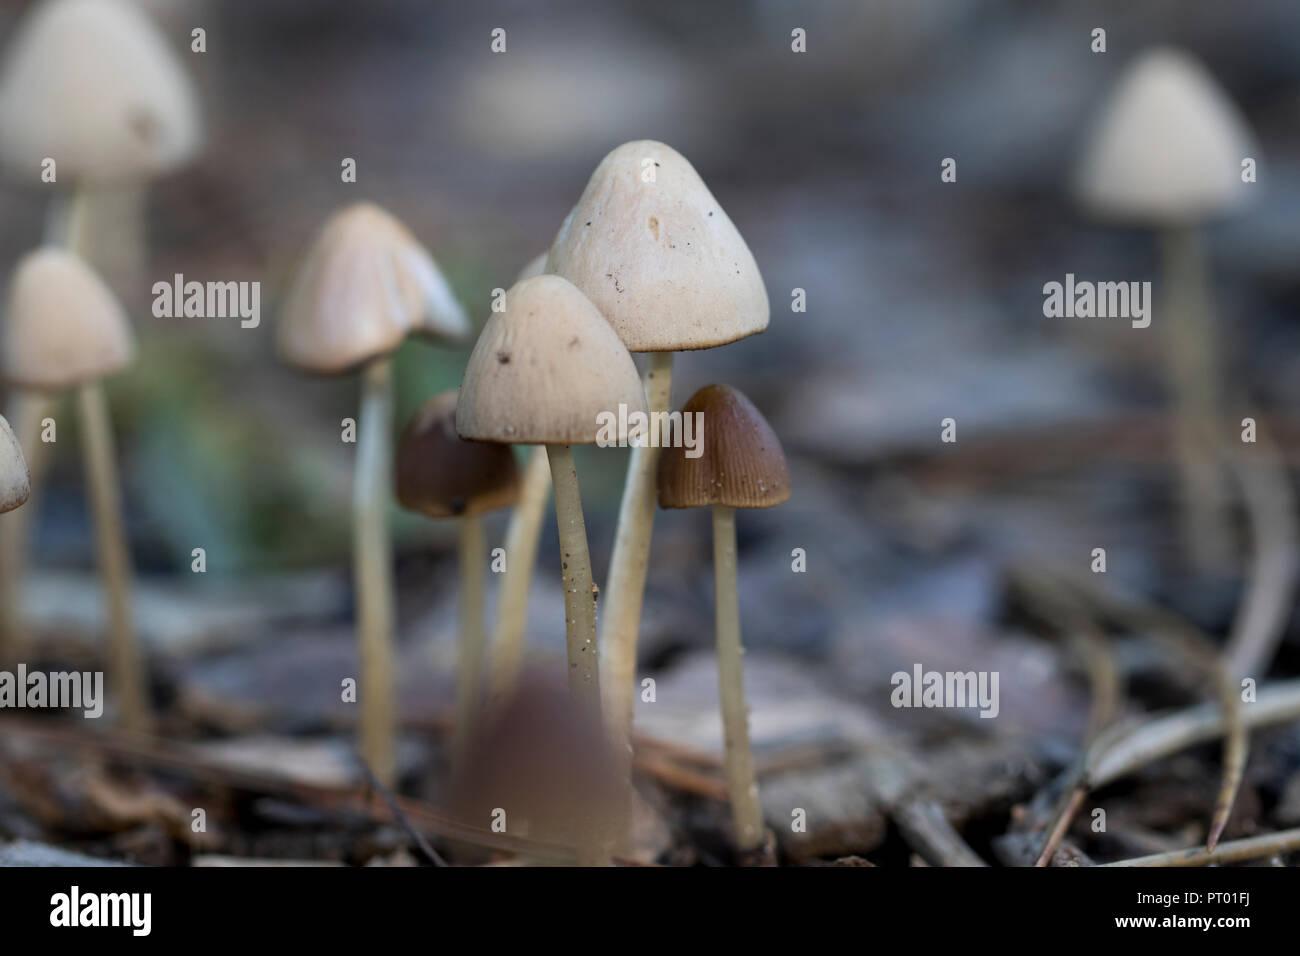 Fruiting bodies of mushrooms. Fungi close up. Mycology concept. - Stock Image